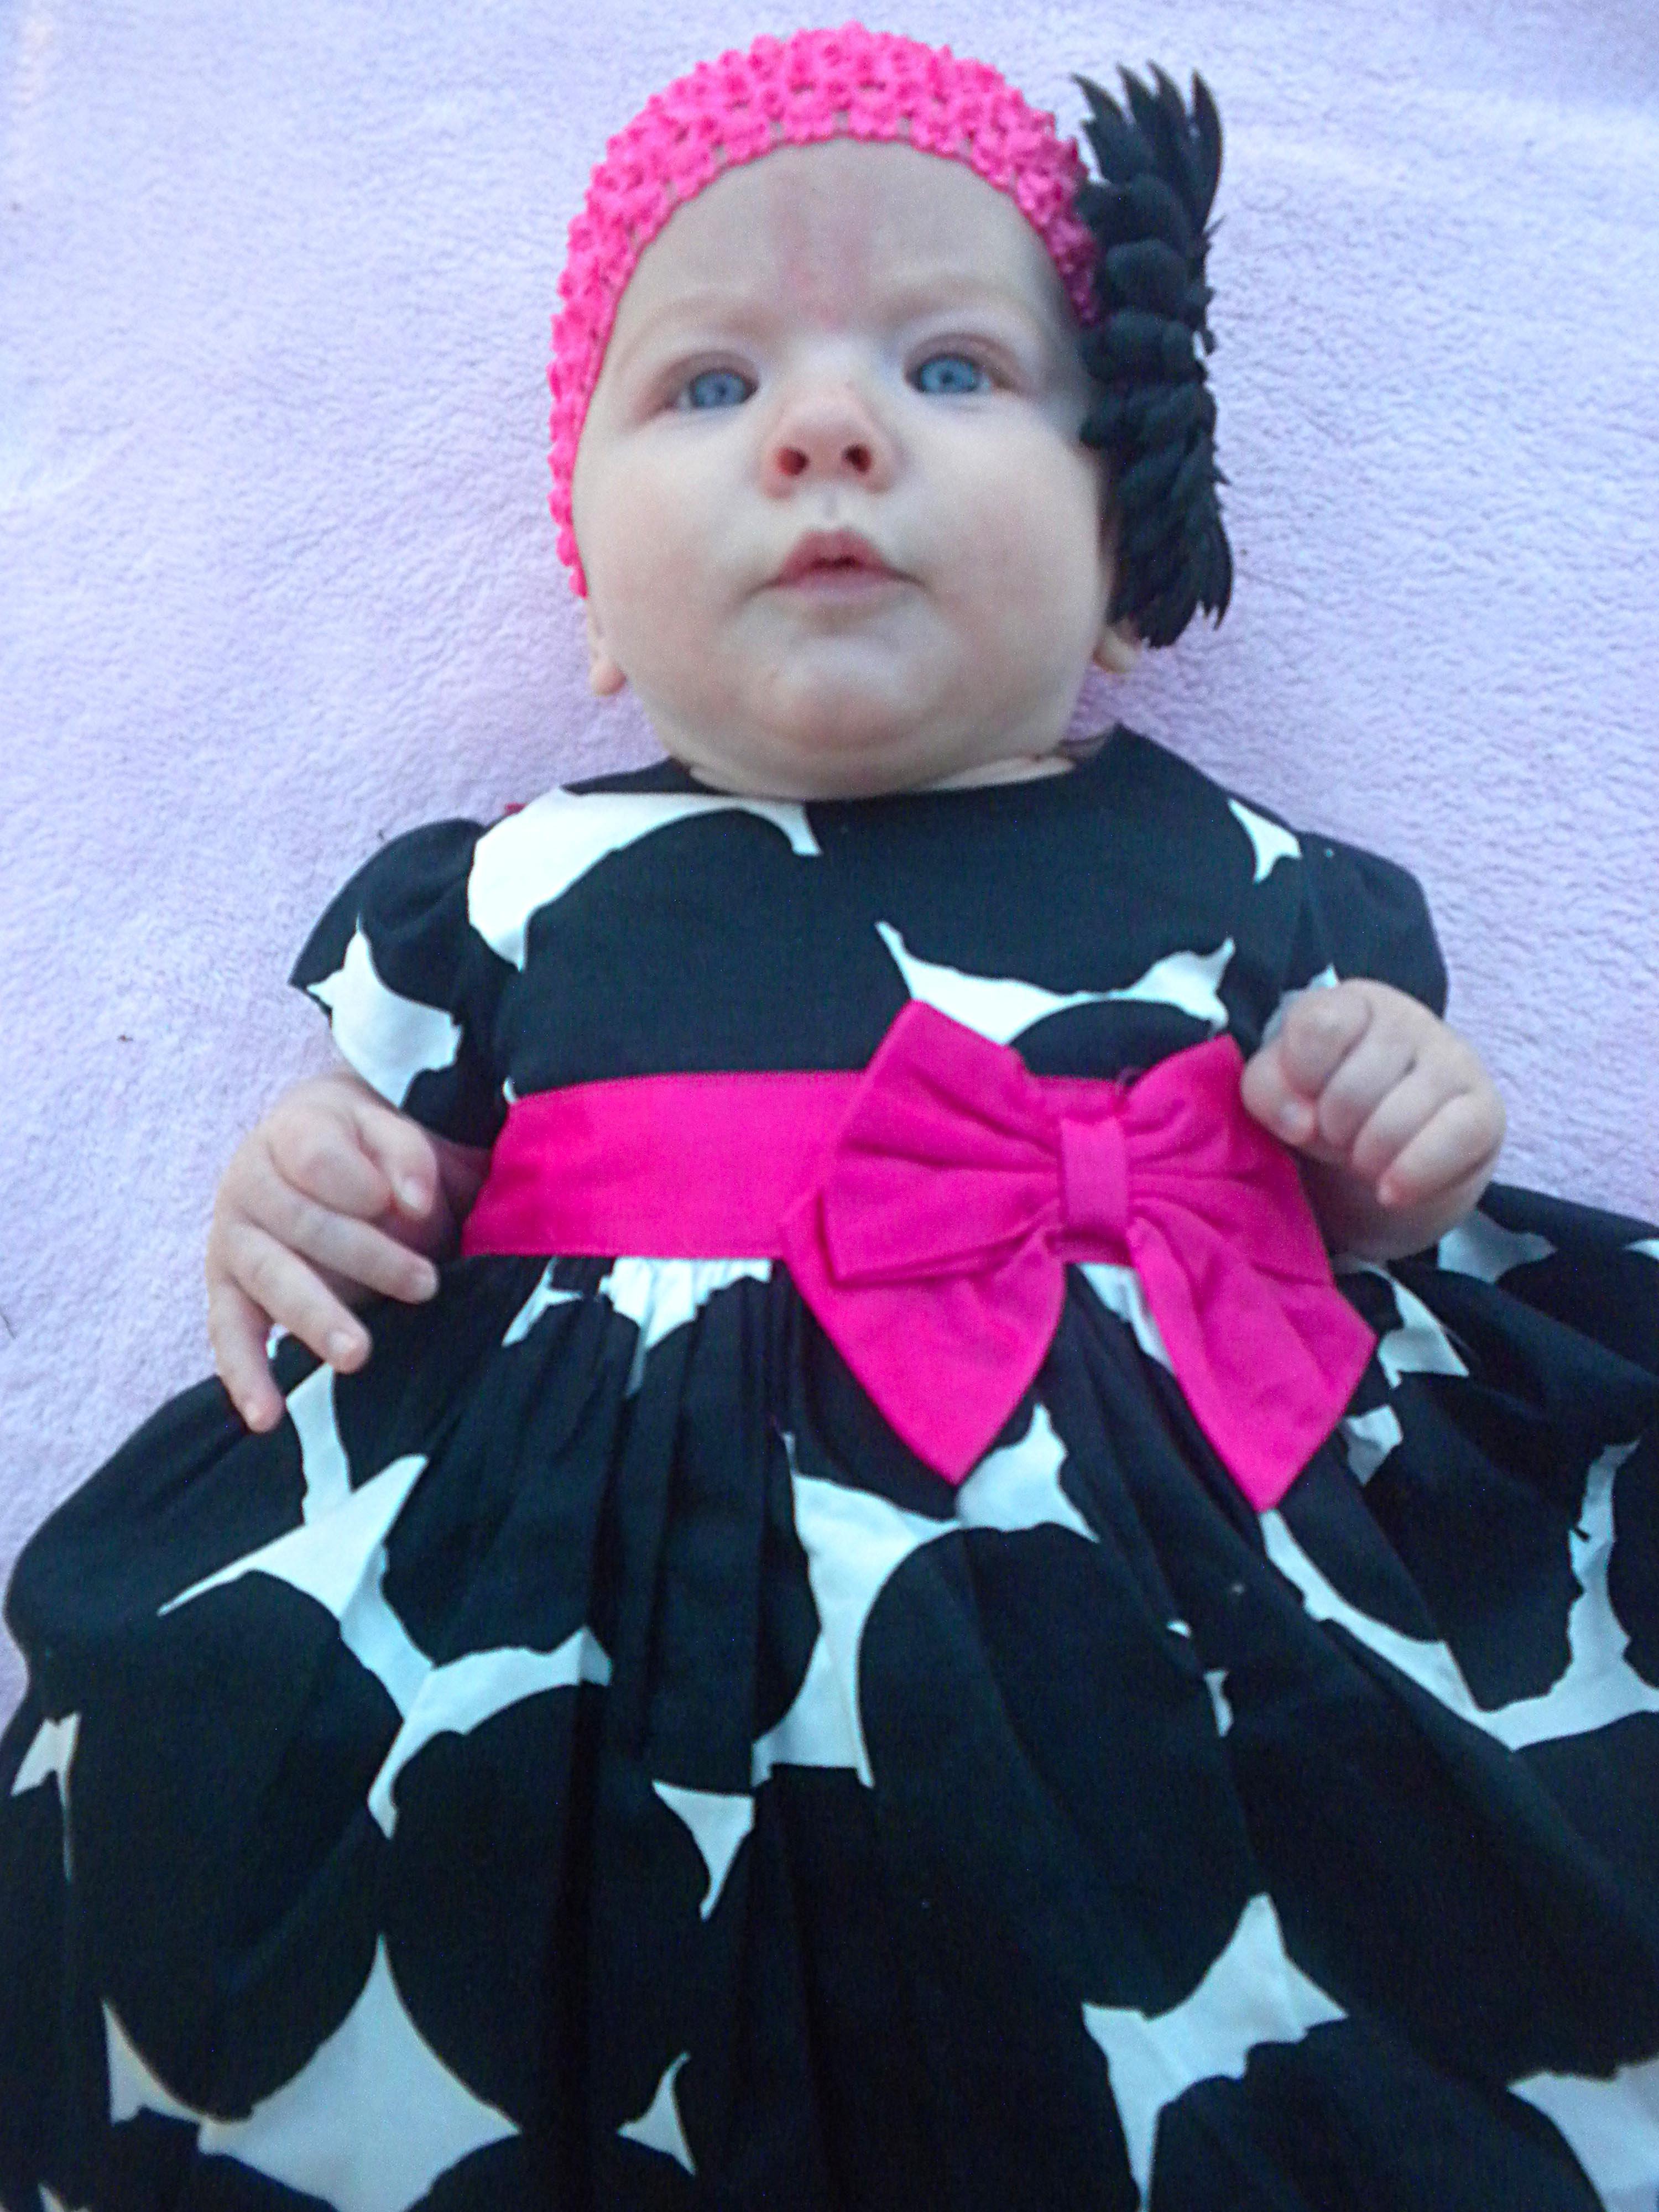 13cb25382 niña blanco dulce linda hembra joven niño ropa negro rosado bebé vestir  contento encantador infantil recién